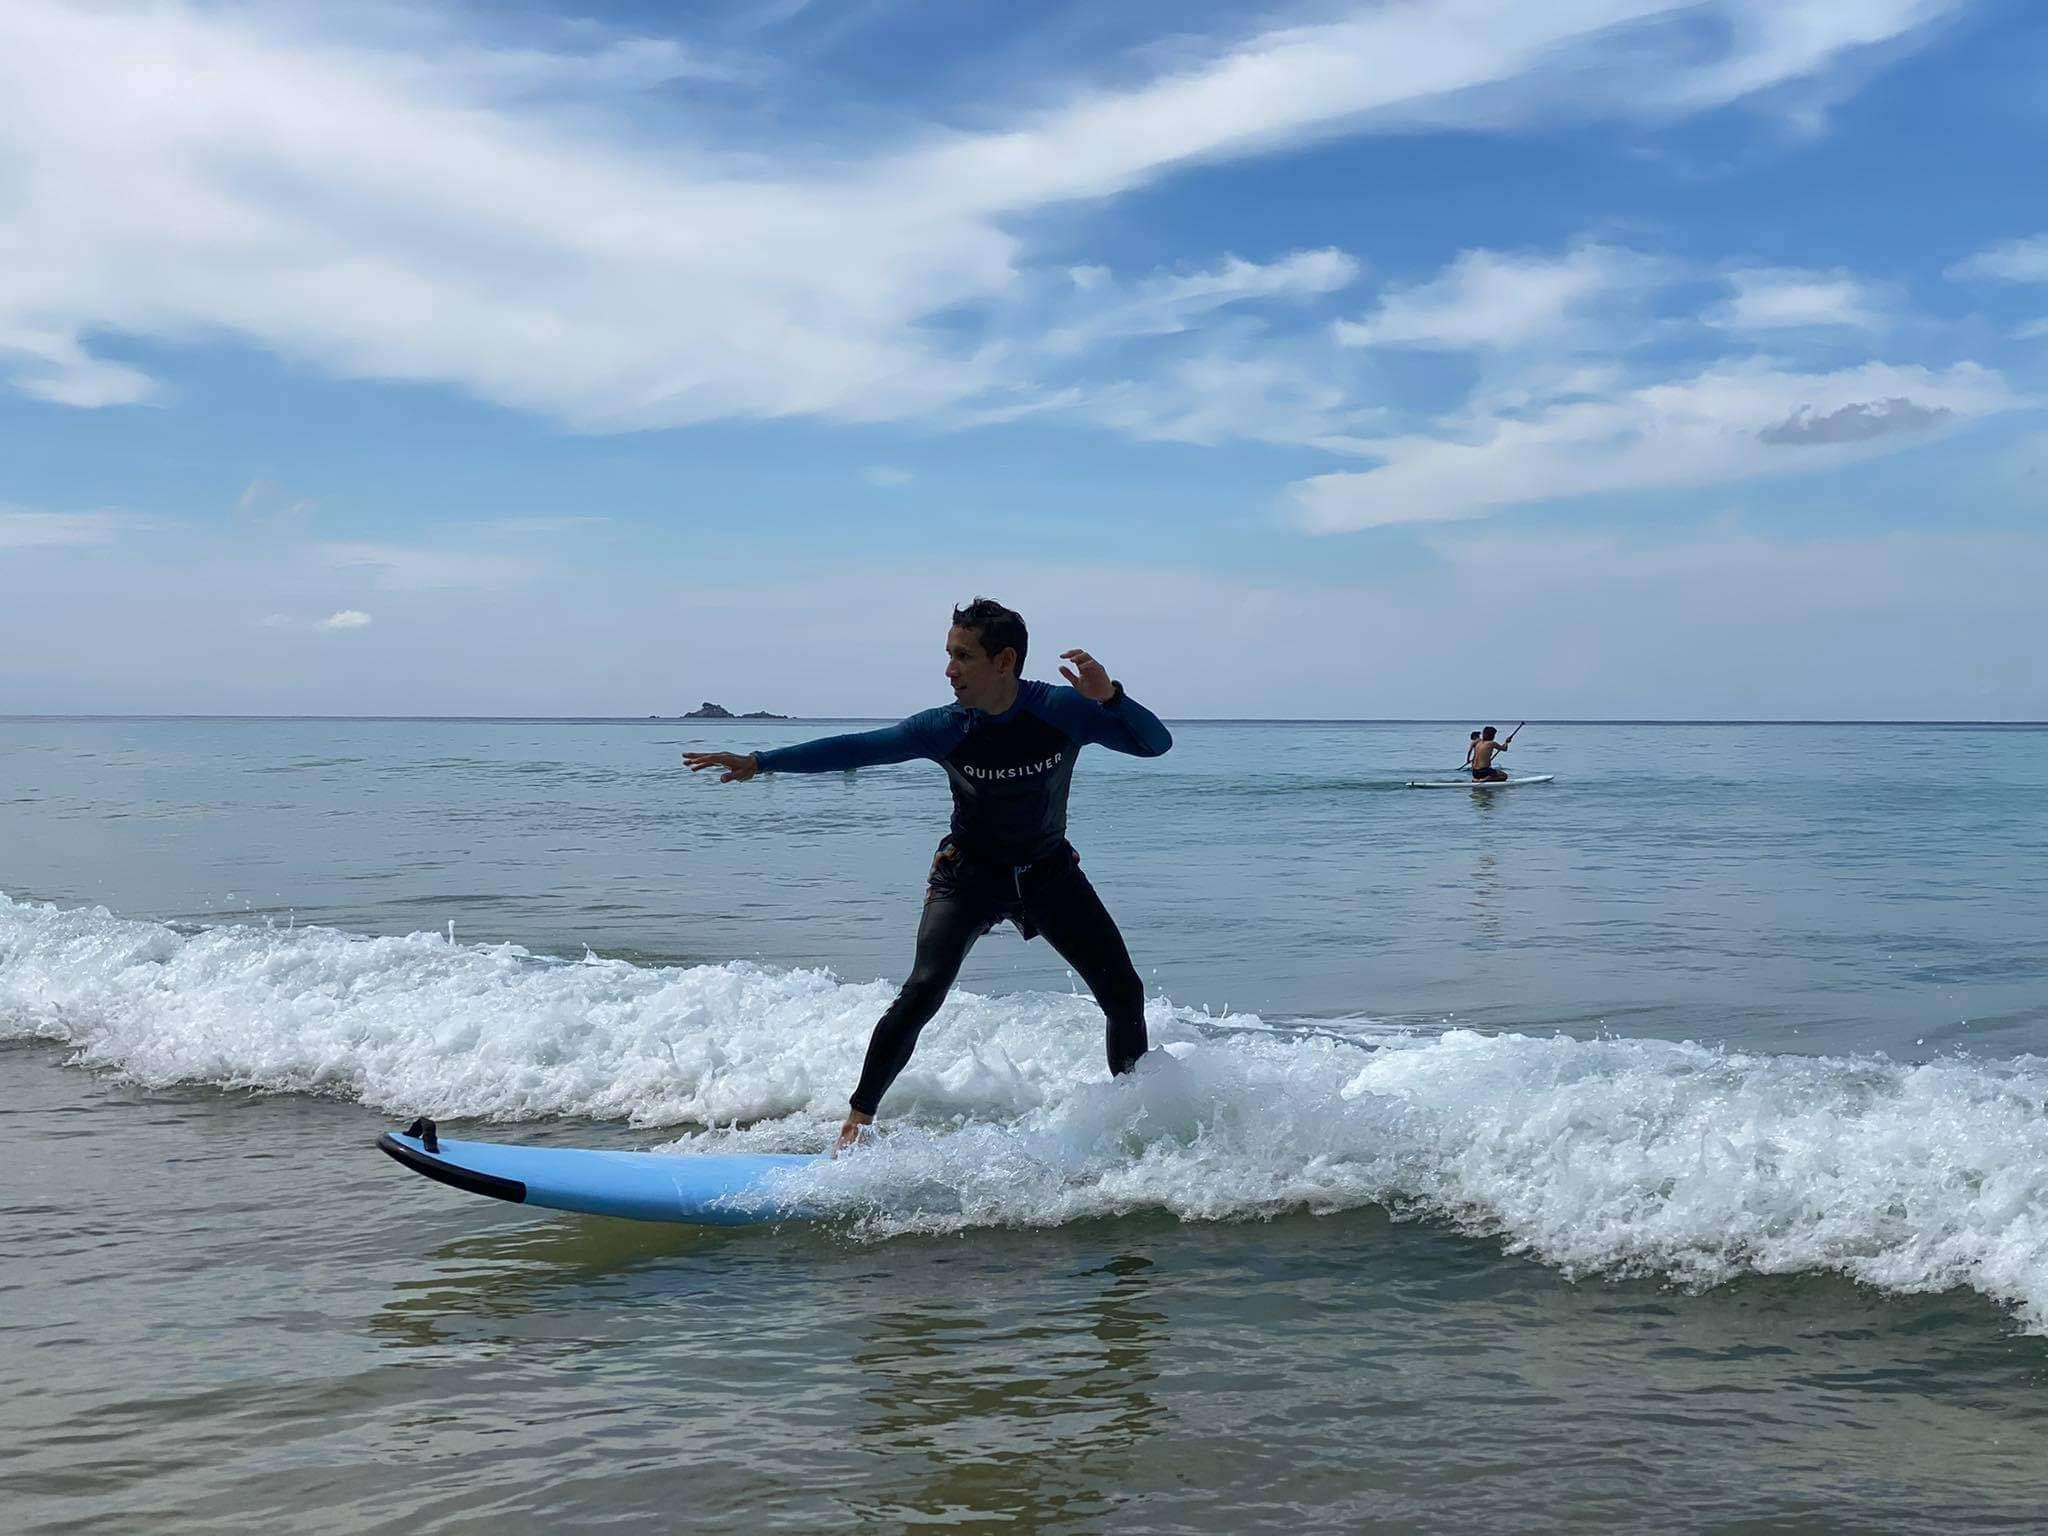 Surfen op golven van Nai Thon Beach op Phuket